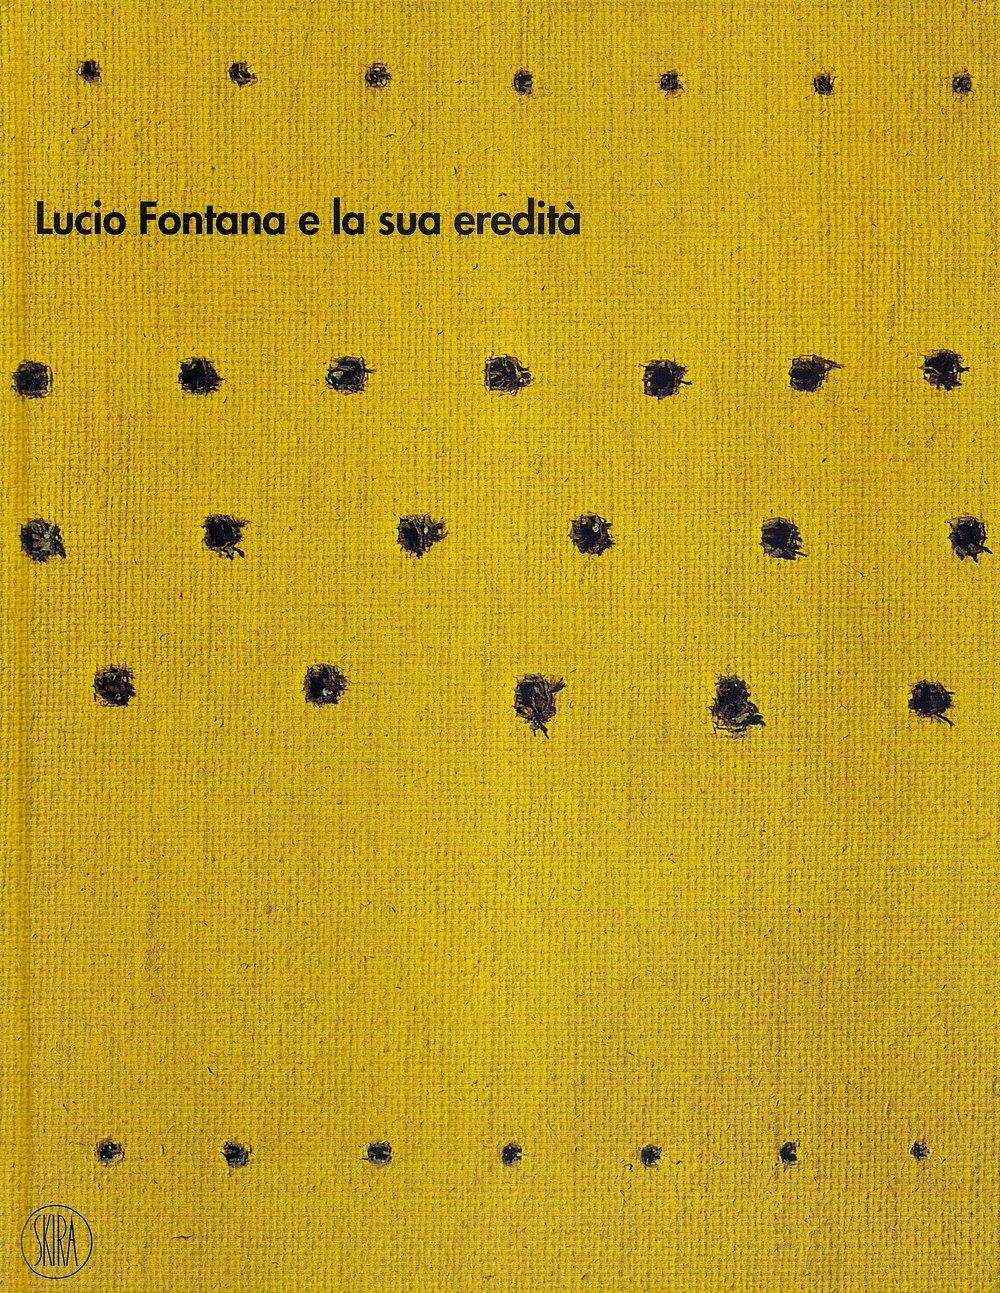 Lucio Fontana  e la sua eredità.jpeg